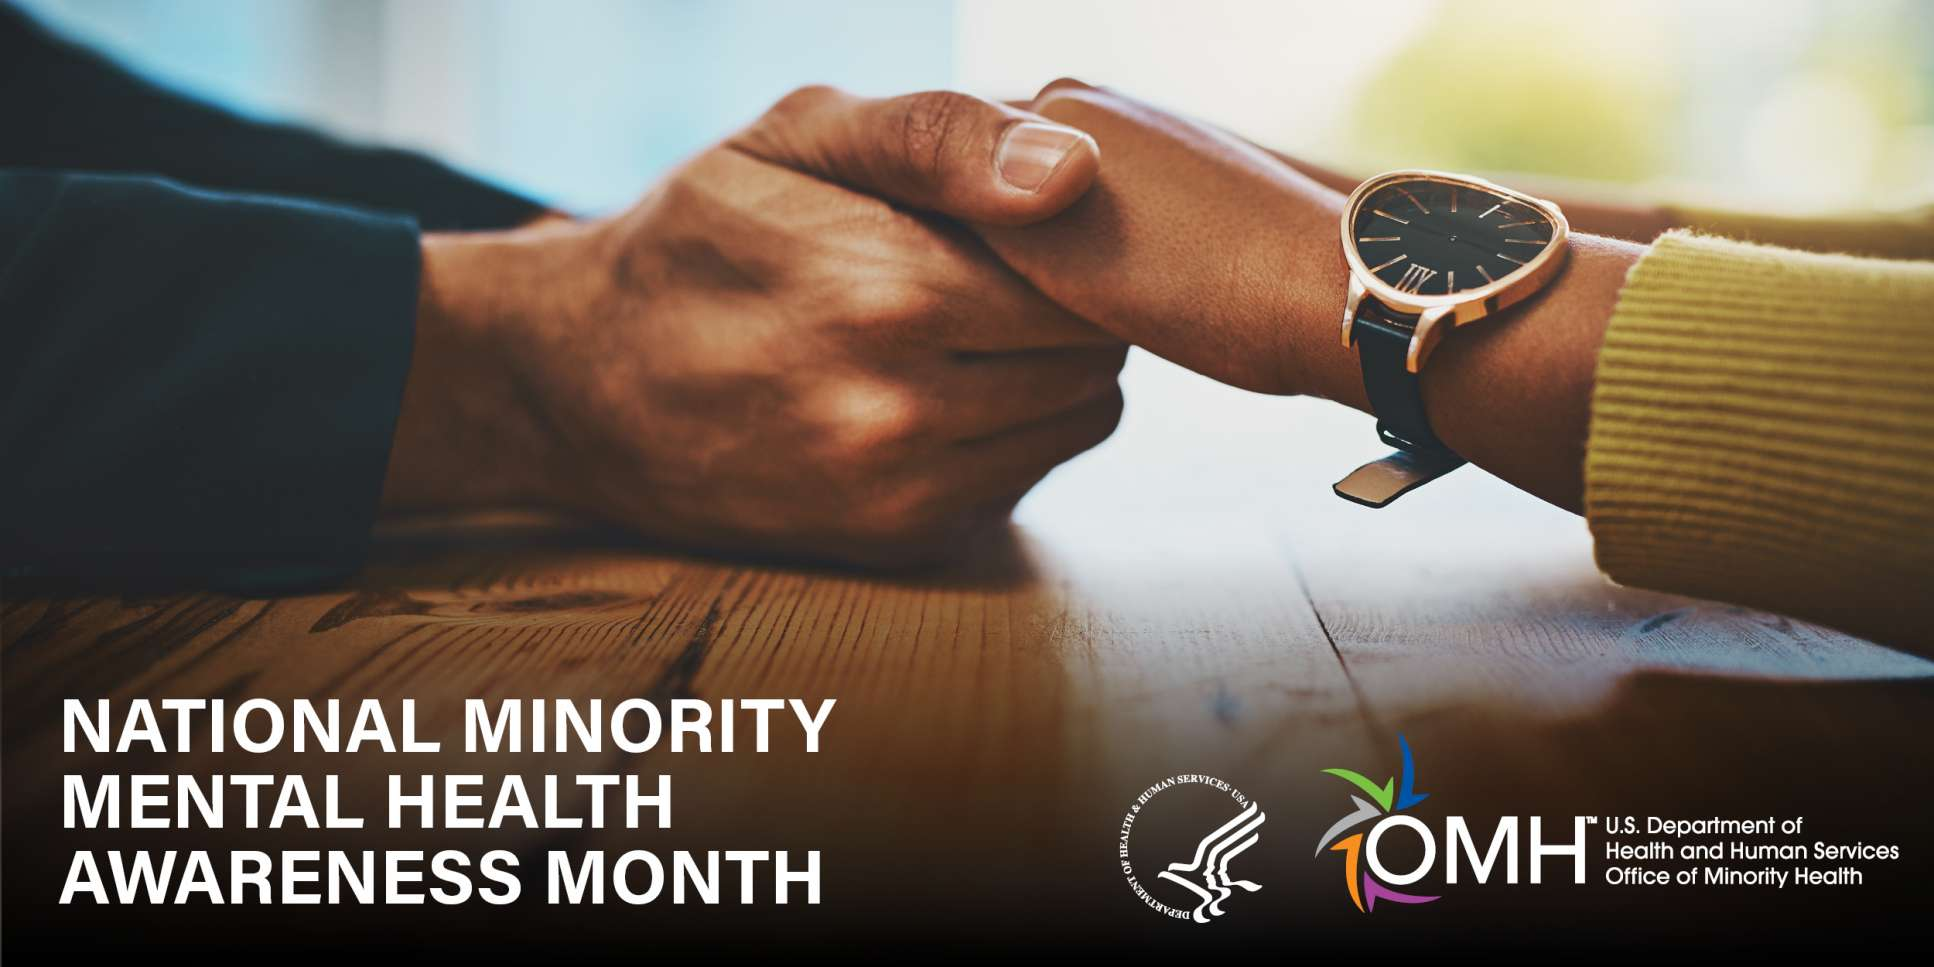 logo for minority mental health awareness month